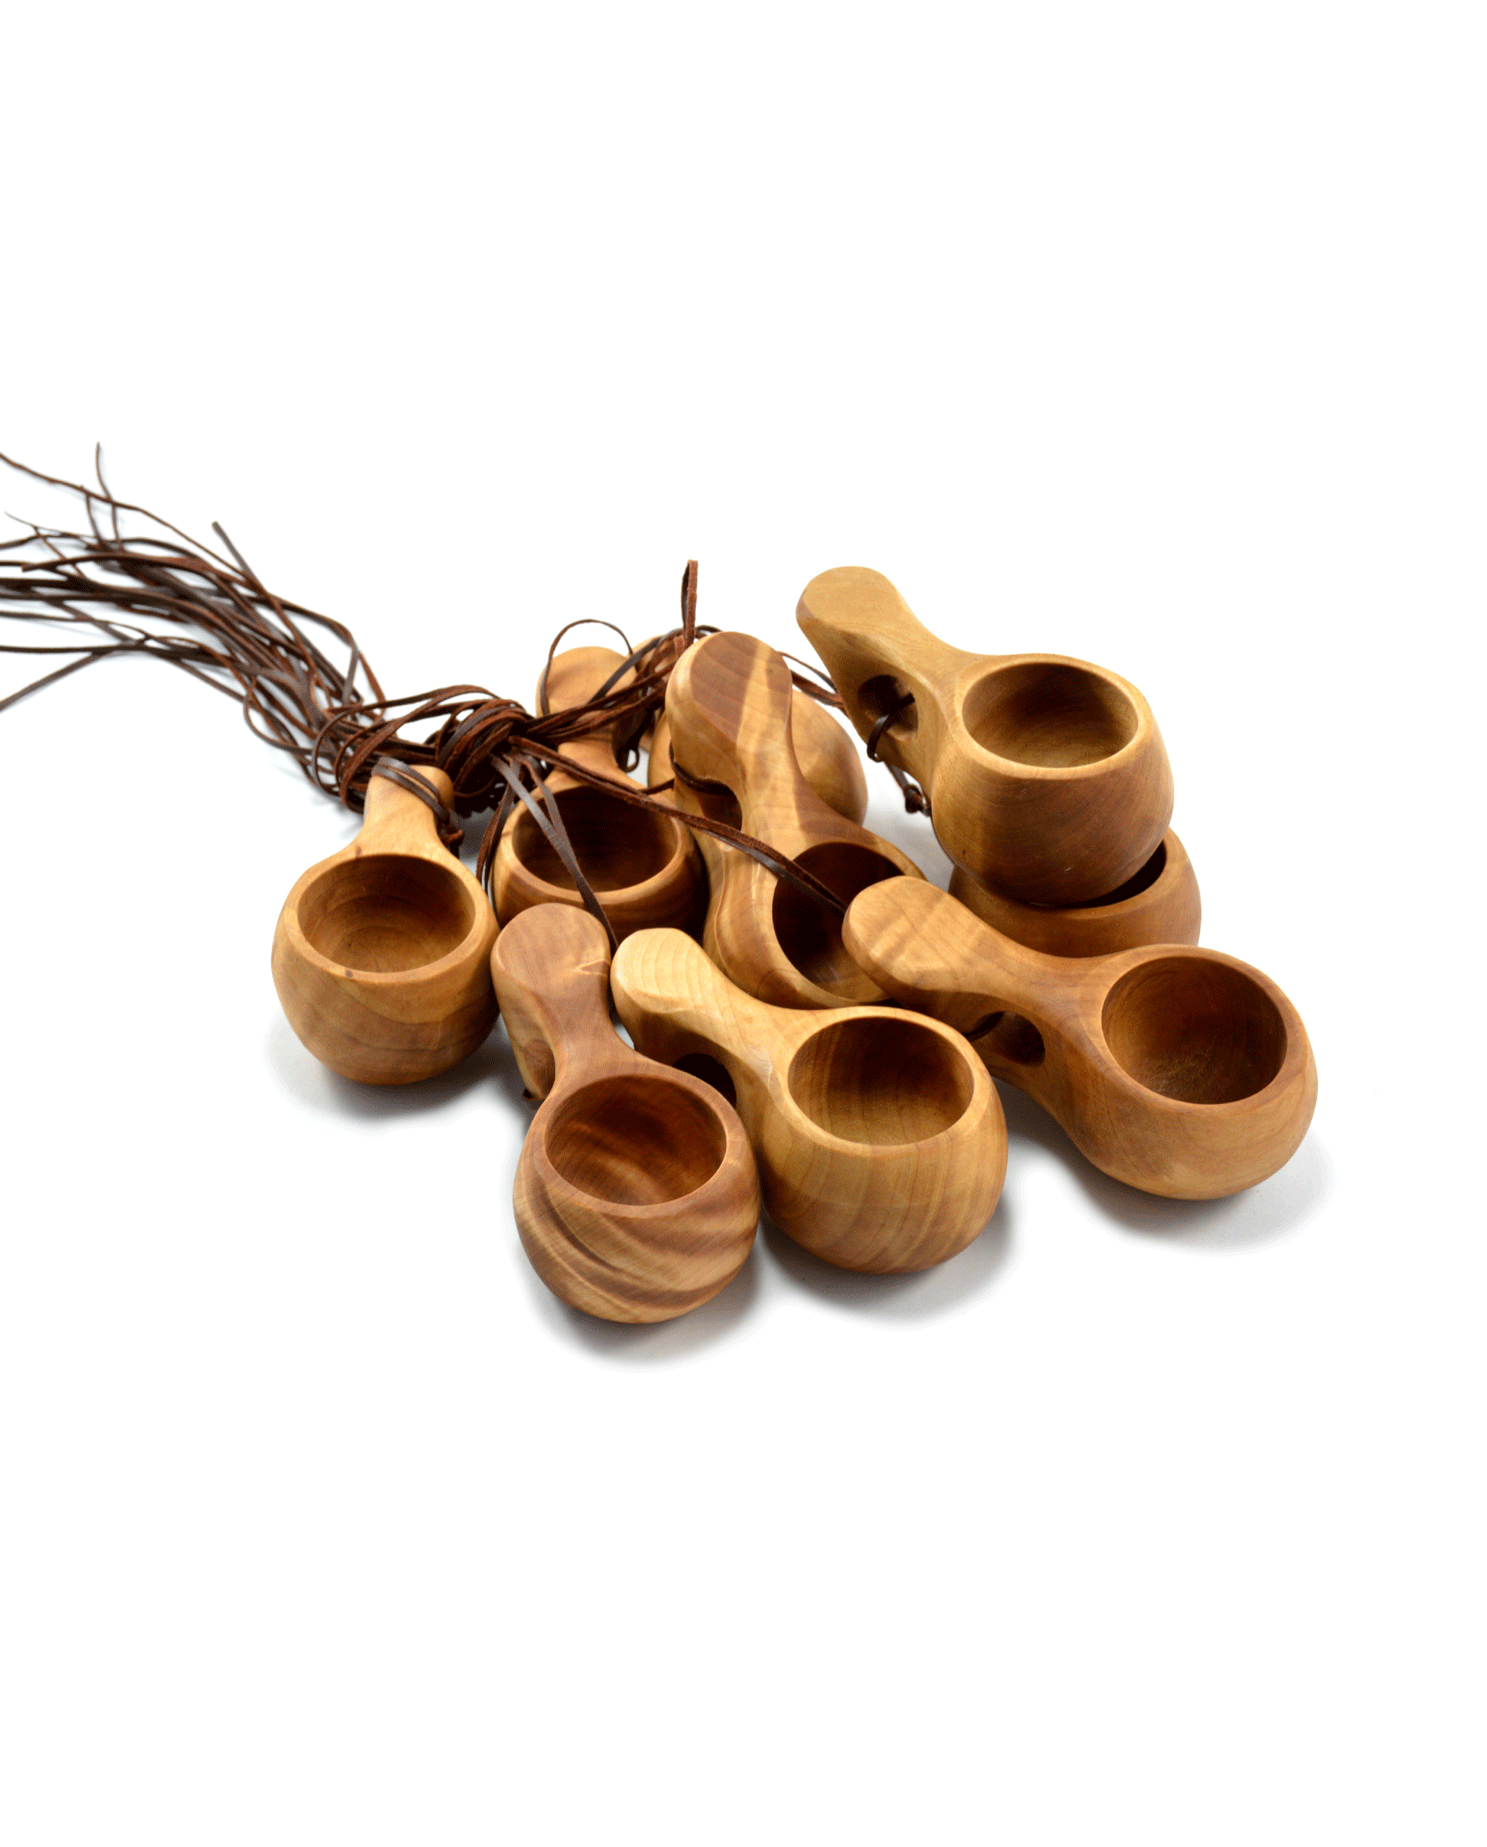 kuksas-asetelma-woodencup-shotsize